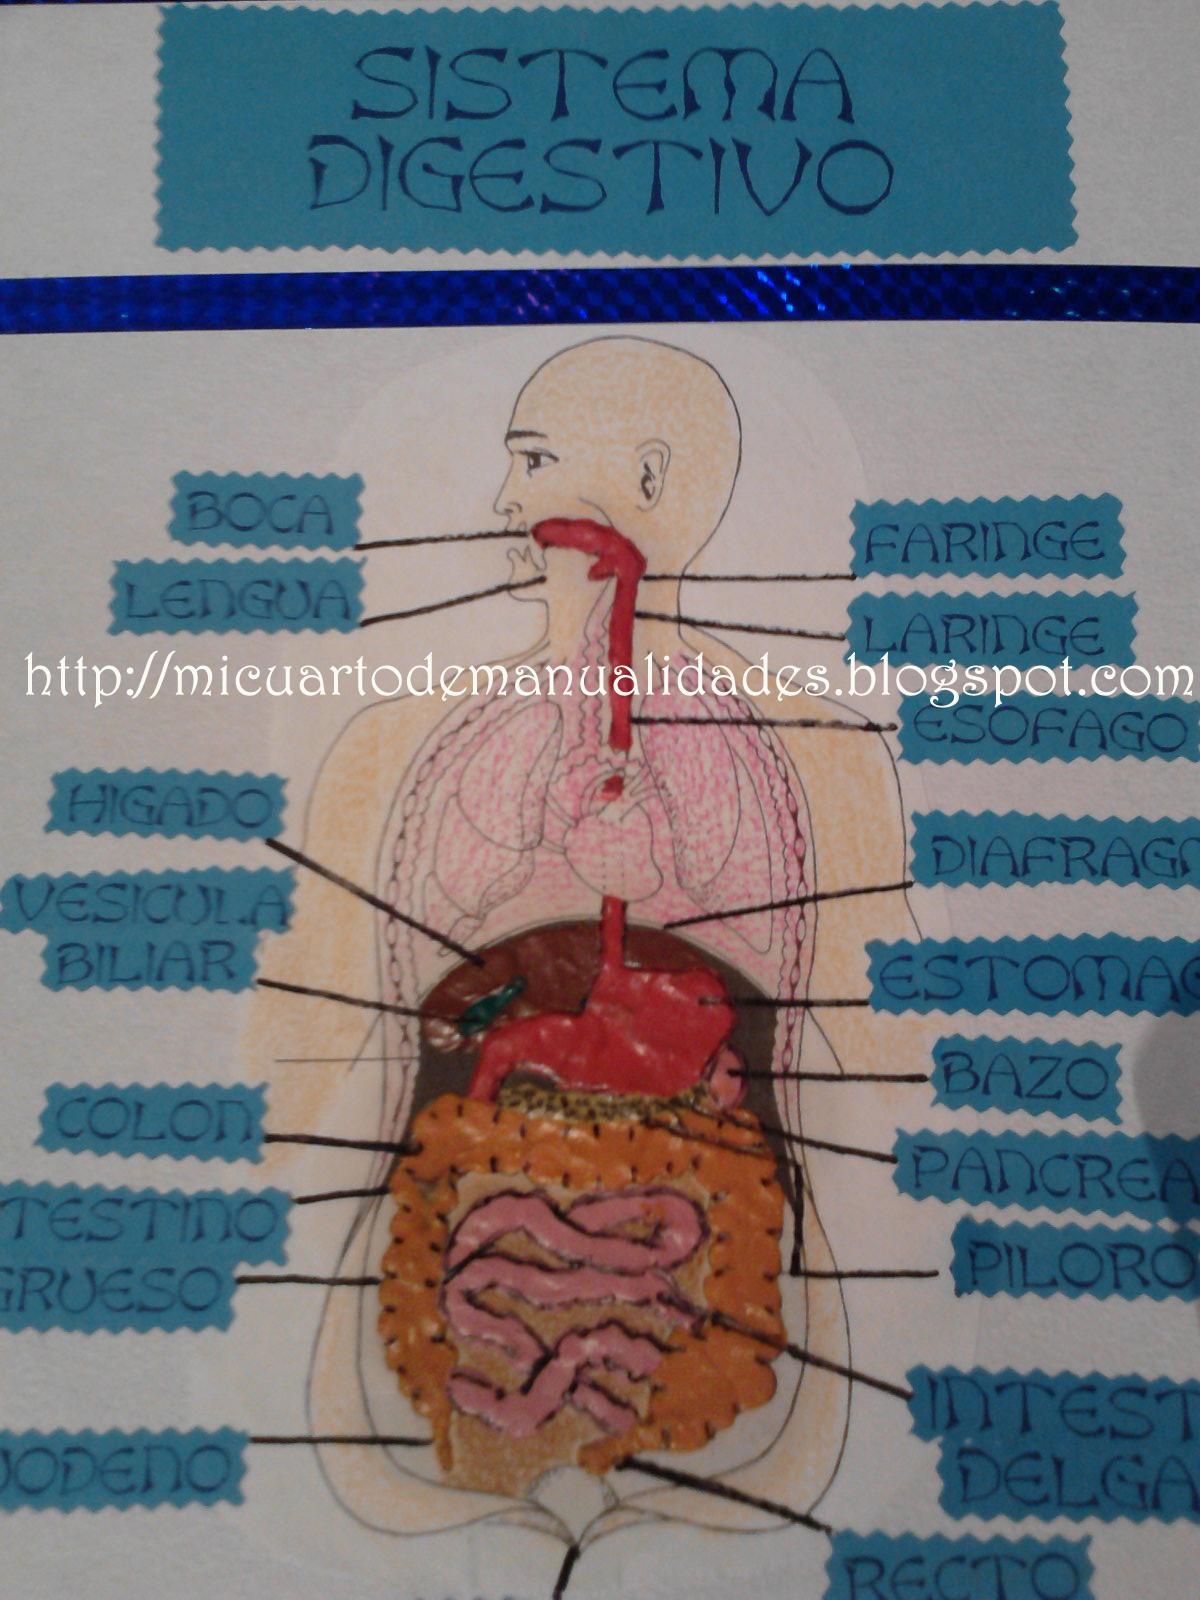 Mi cuarto de manualidades * Esther *: Sistema digestivo de plastilina